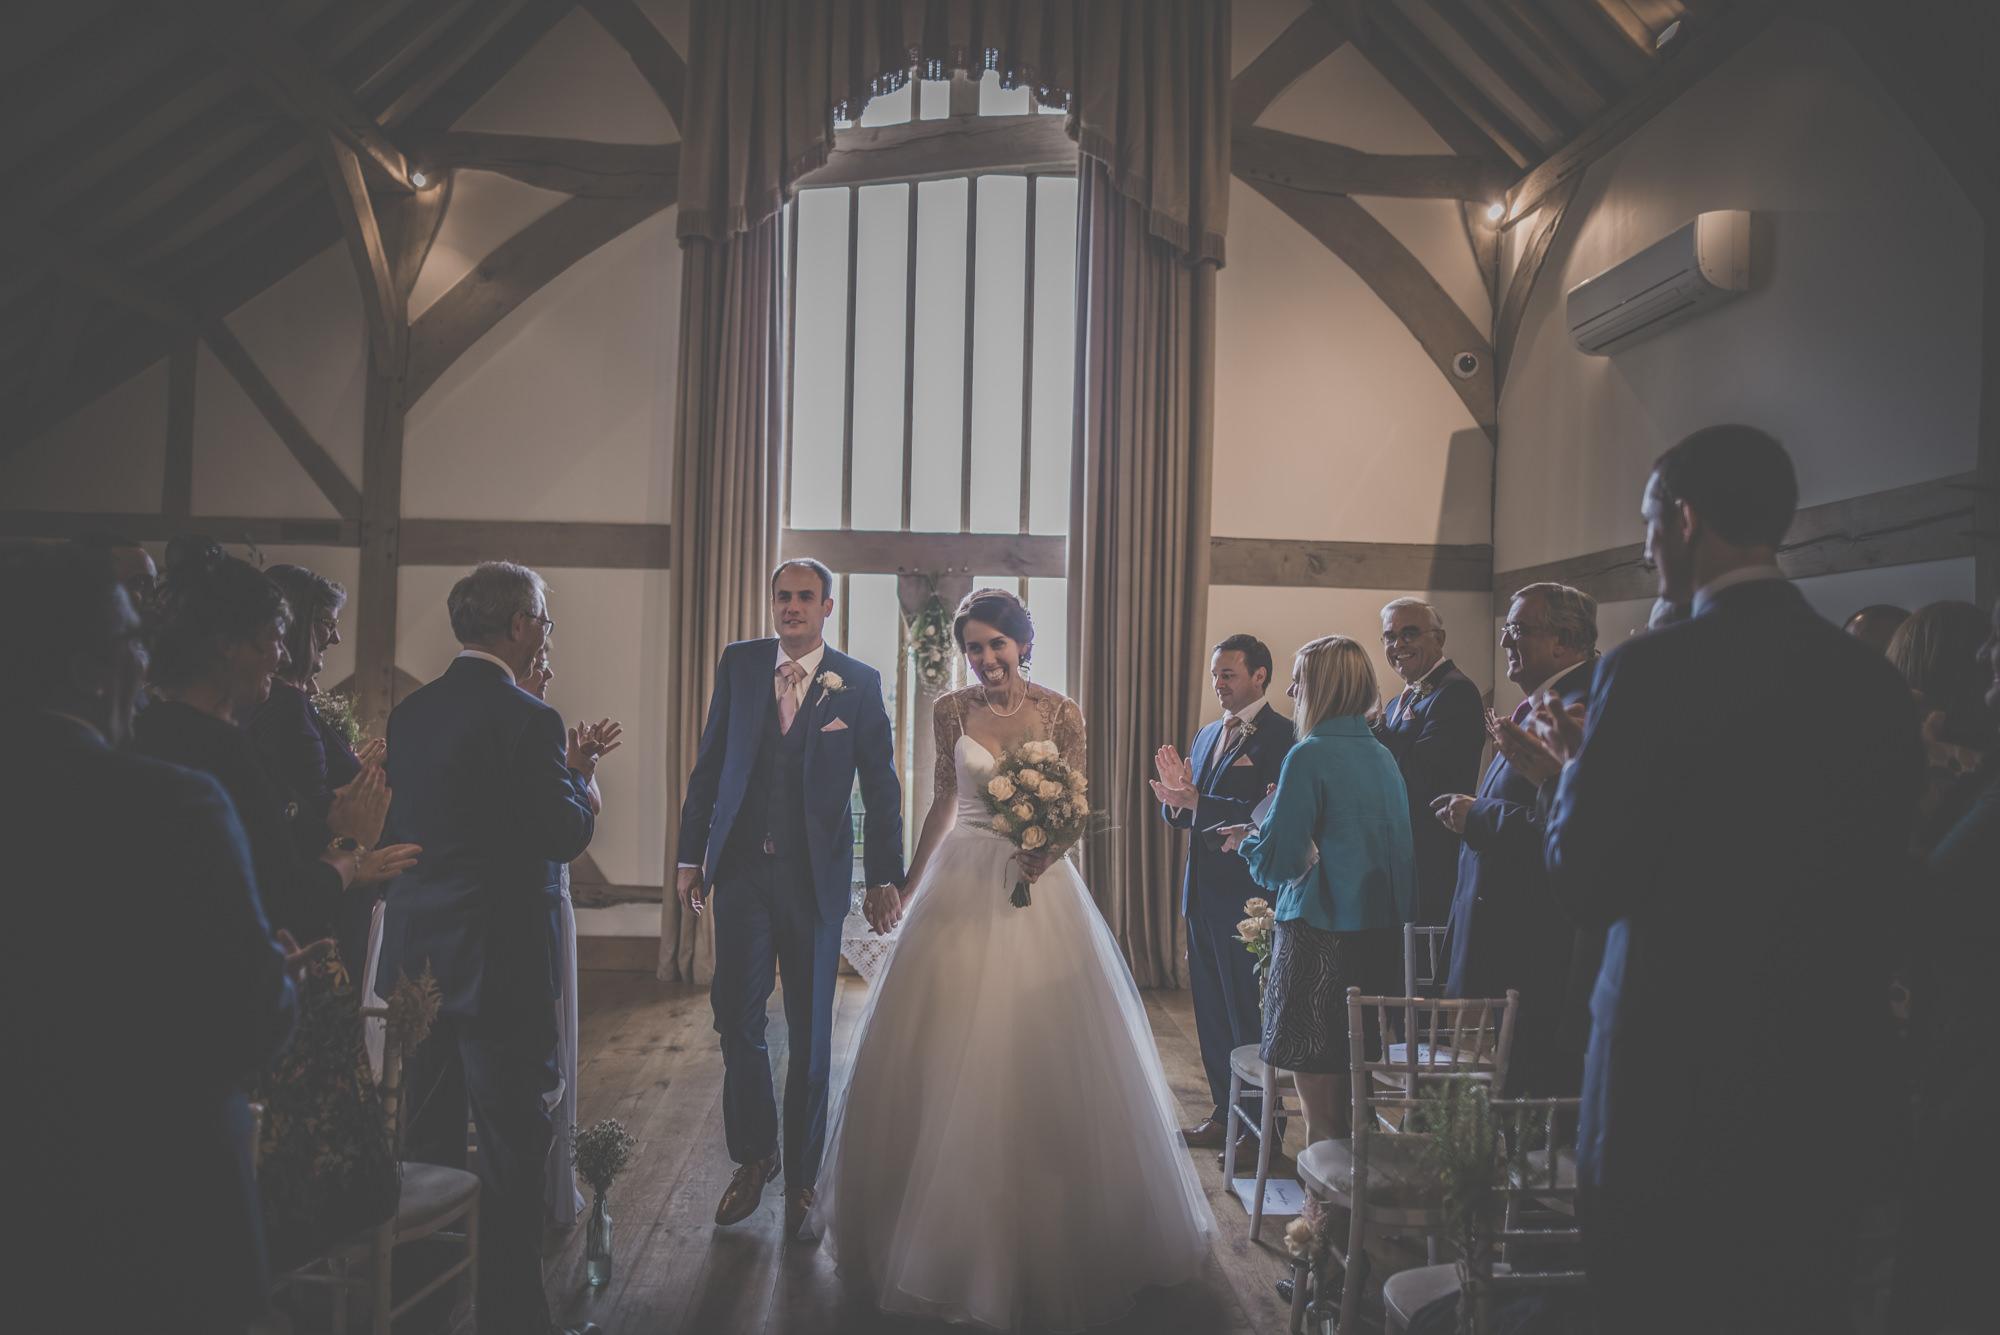 Charisse-and-James-wedding-in-Cain-Manor-Venue-Hampshire-Manu-Mendoza-Wedding-Photography-326.jpg